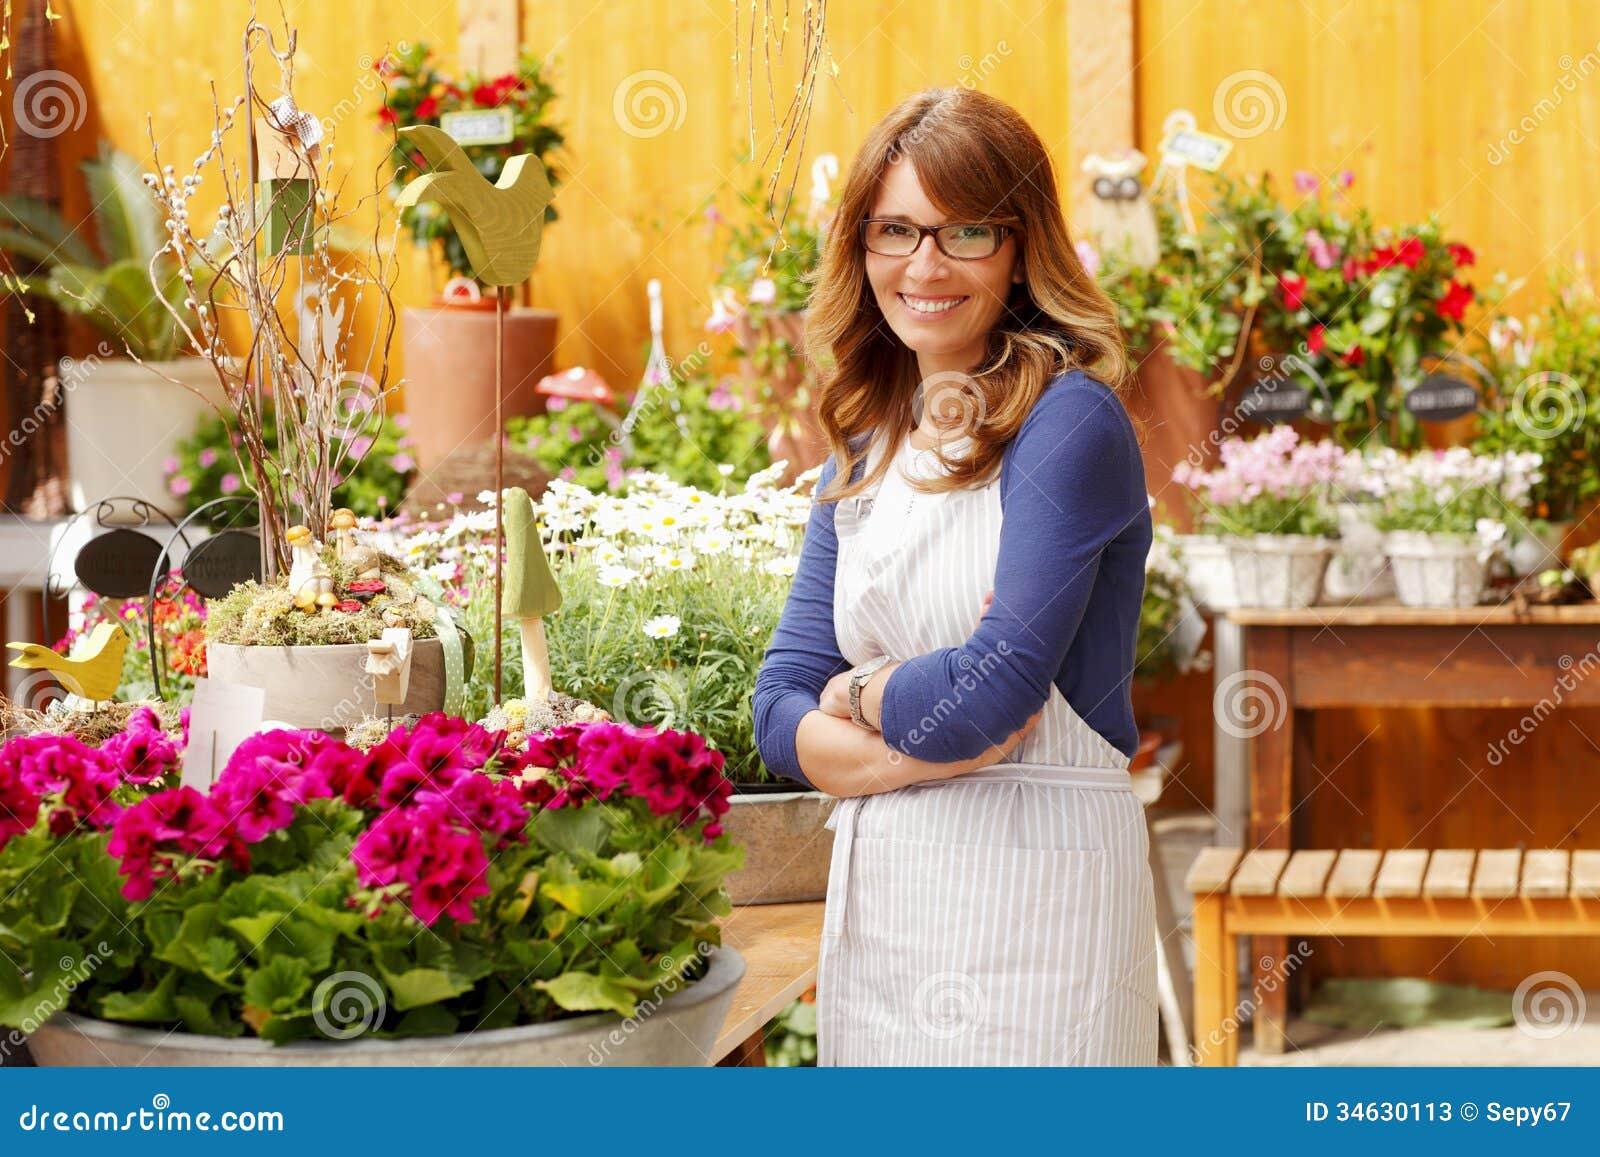 florist business cards